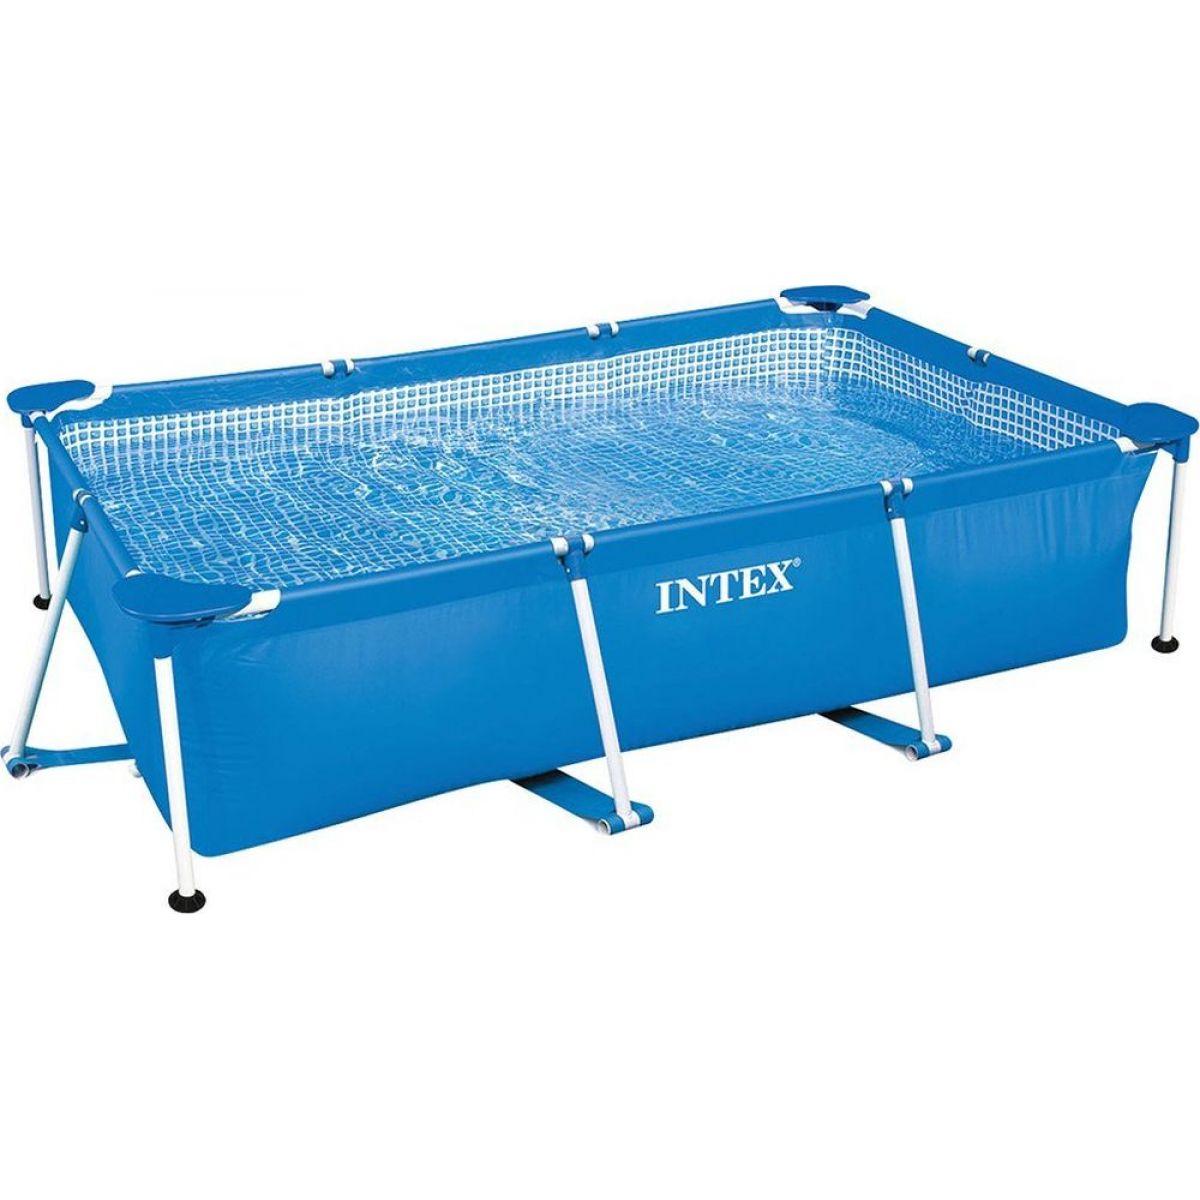 Intex 28270 Metal Frame 220 x 150 x 60 cm